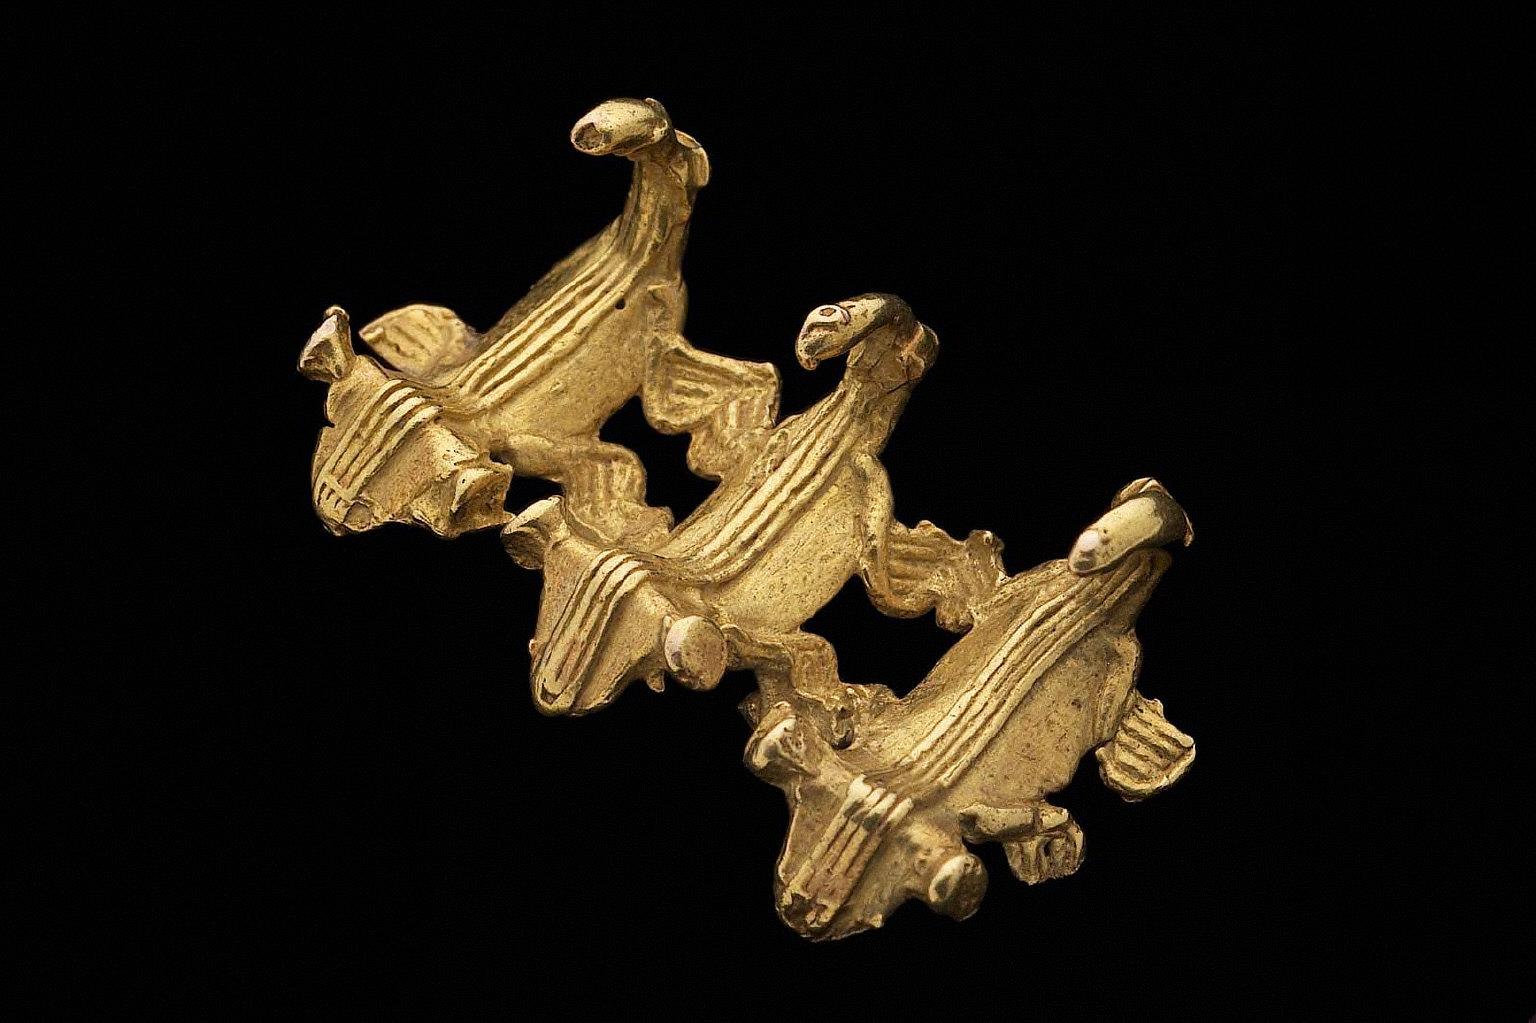 Effigy pendant, possibly zoomorphic